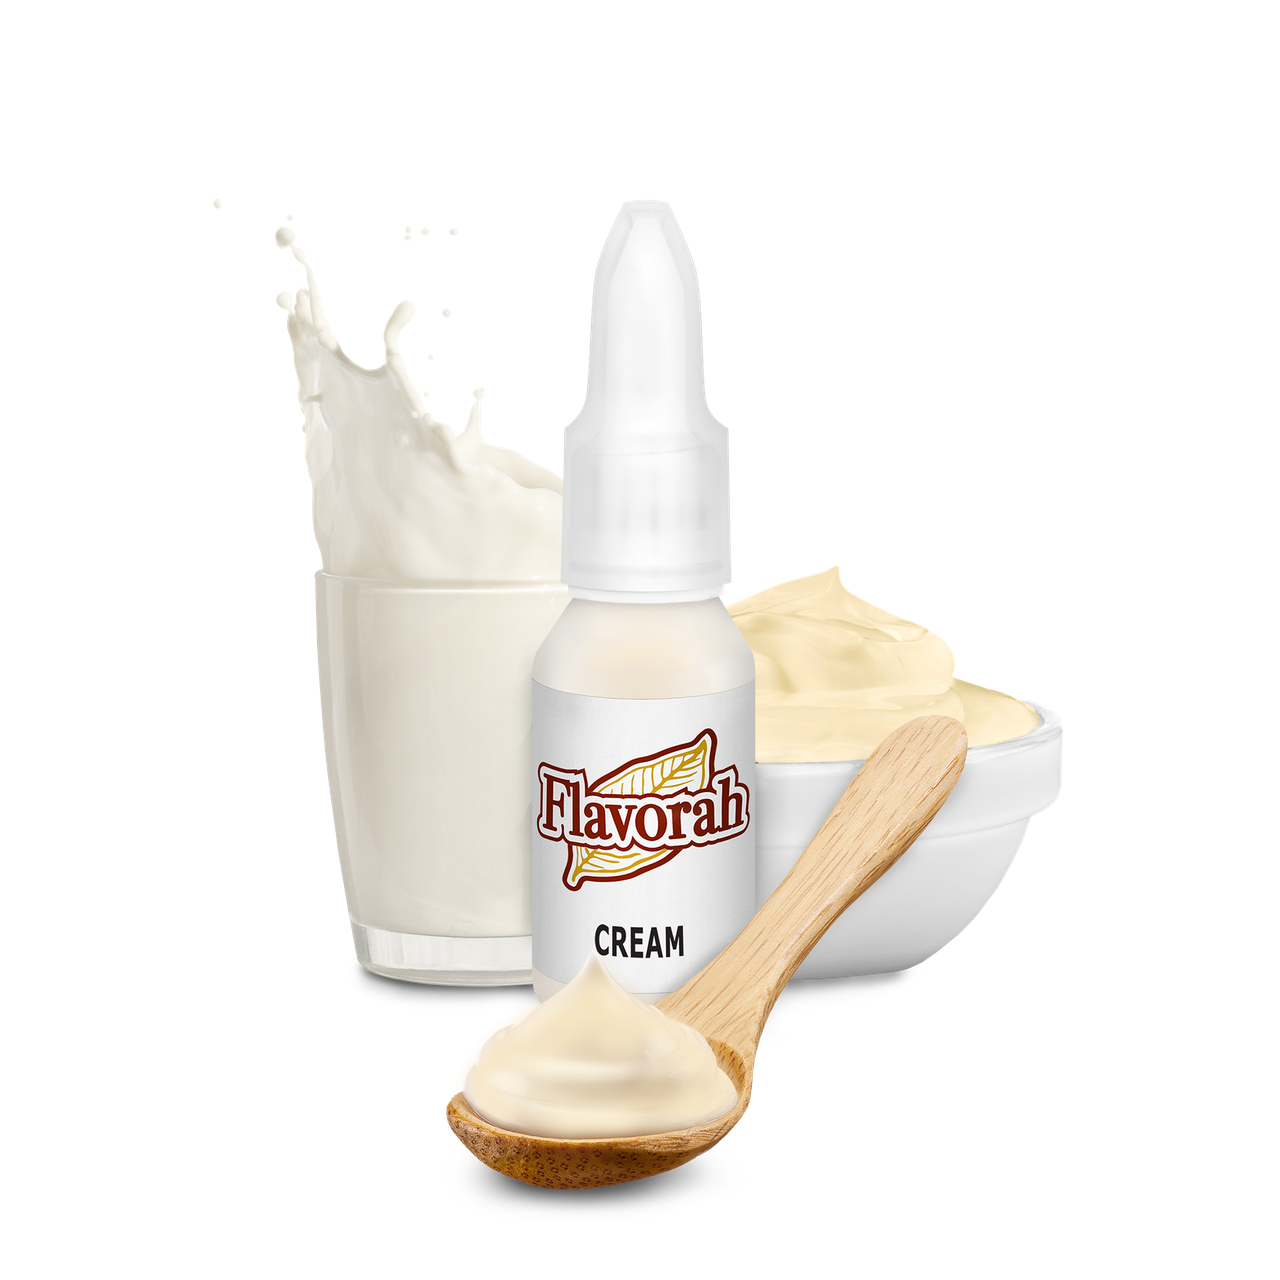 Ароматизатор Flavorah - Cream (Крем), 15 мл.